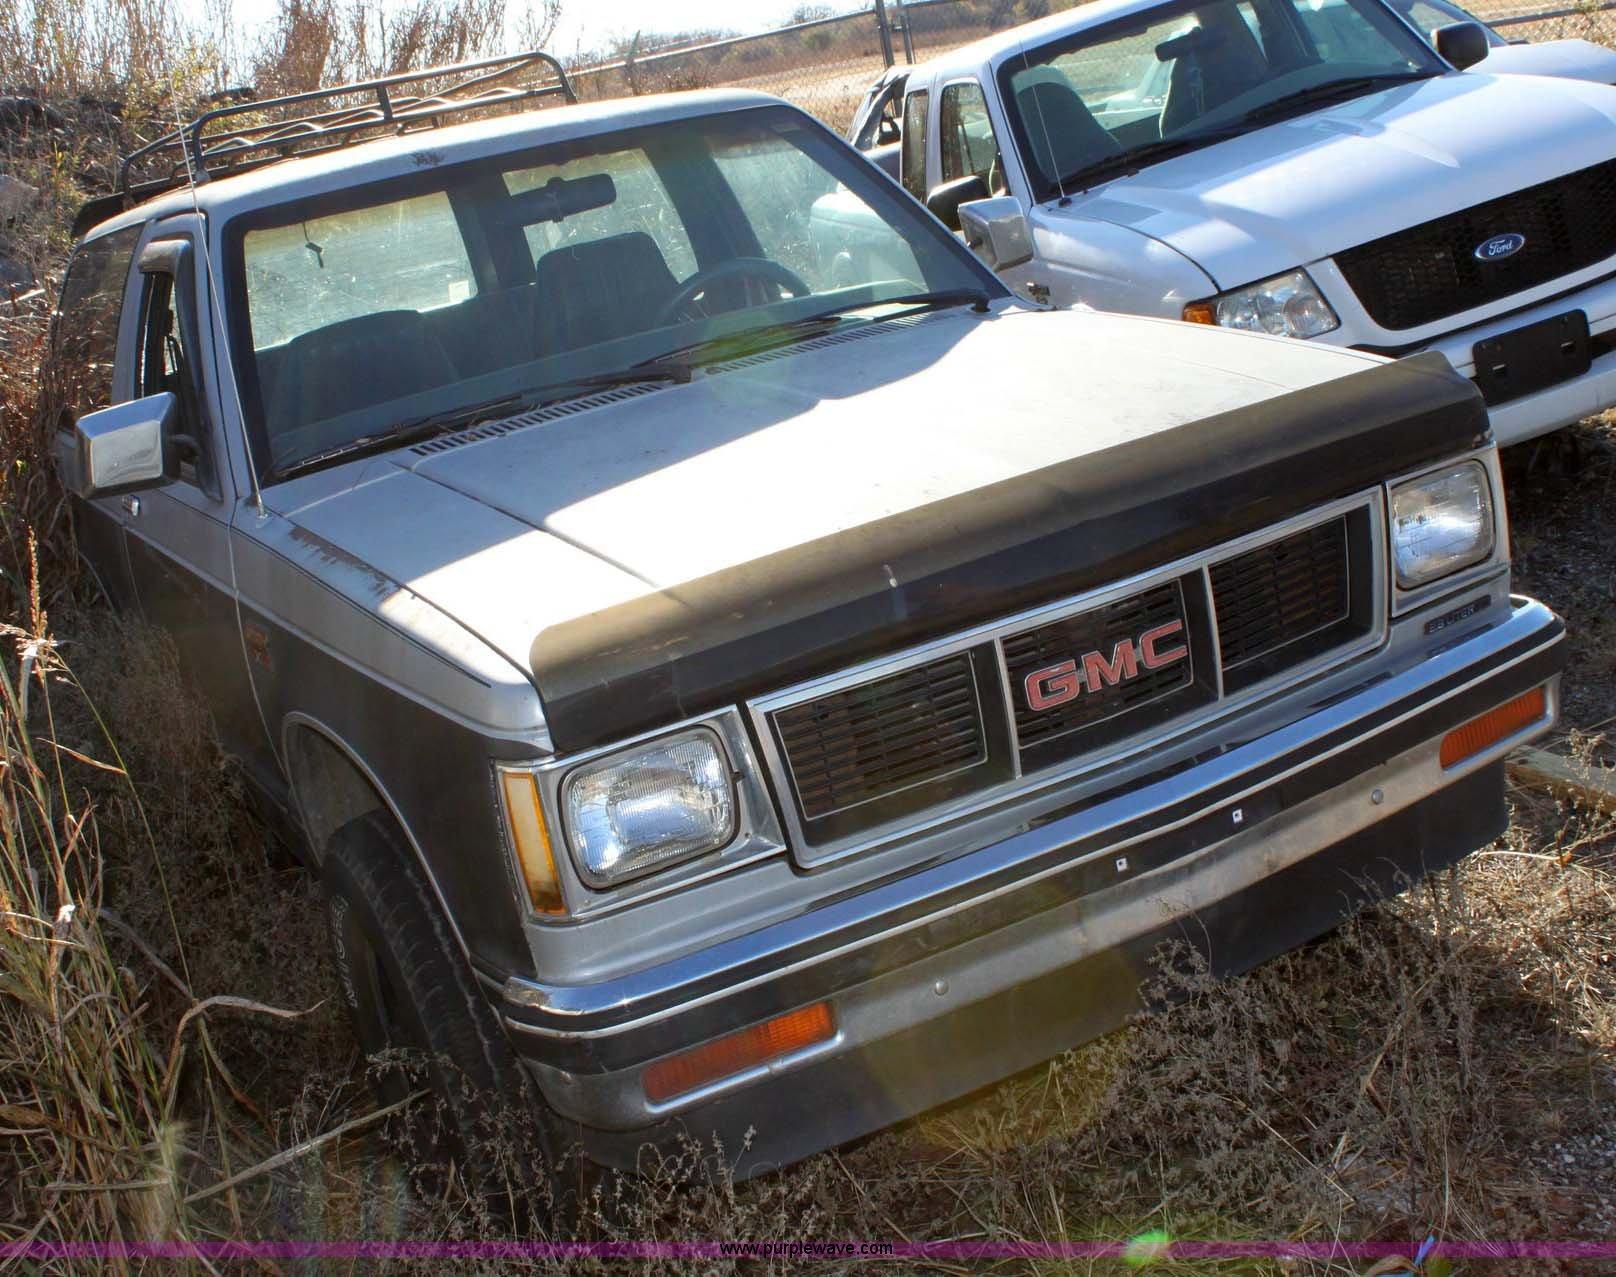 1984 GMC Jimmy S15 | Item 6384 | SOLD! December 14 Governmen